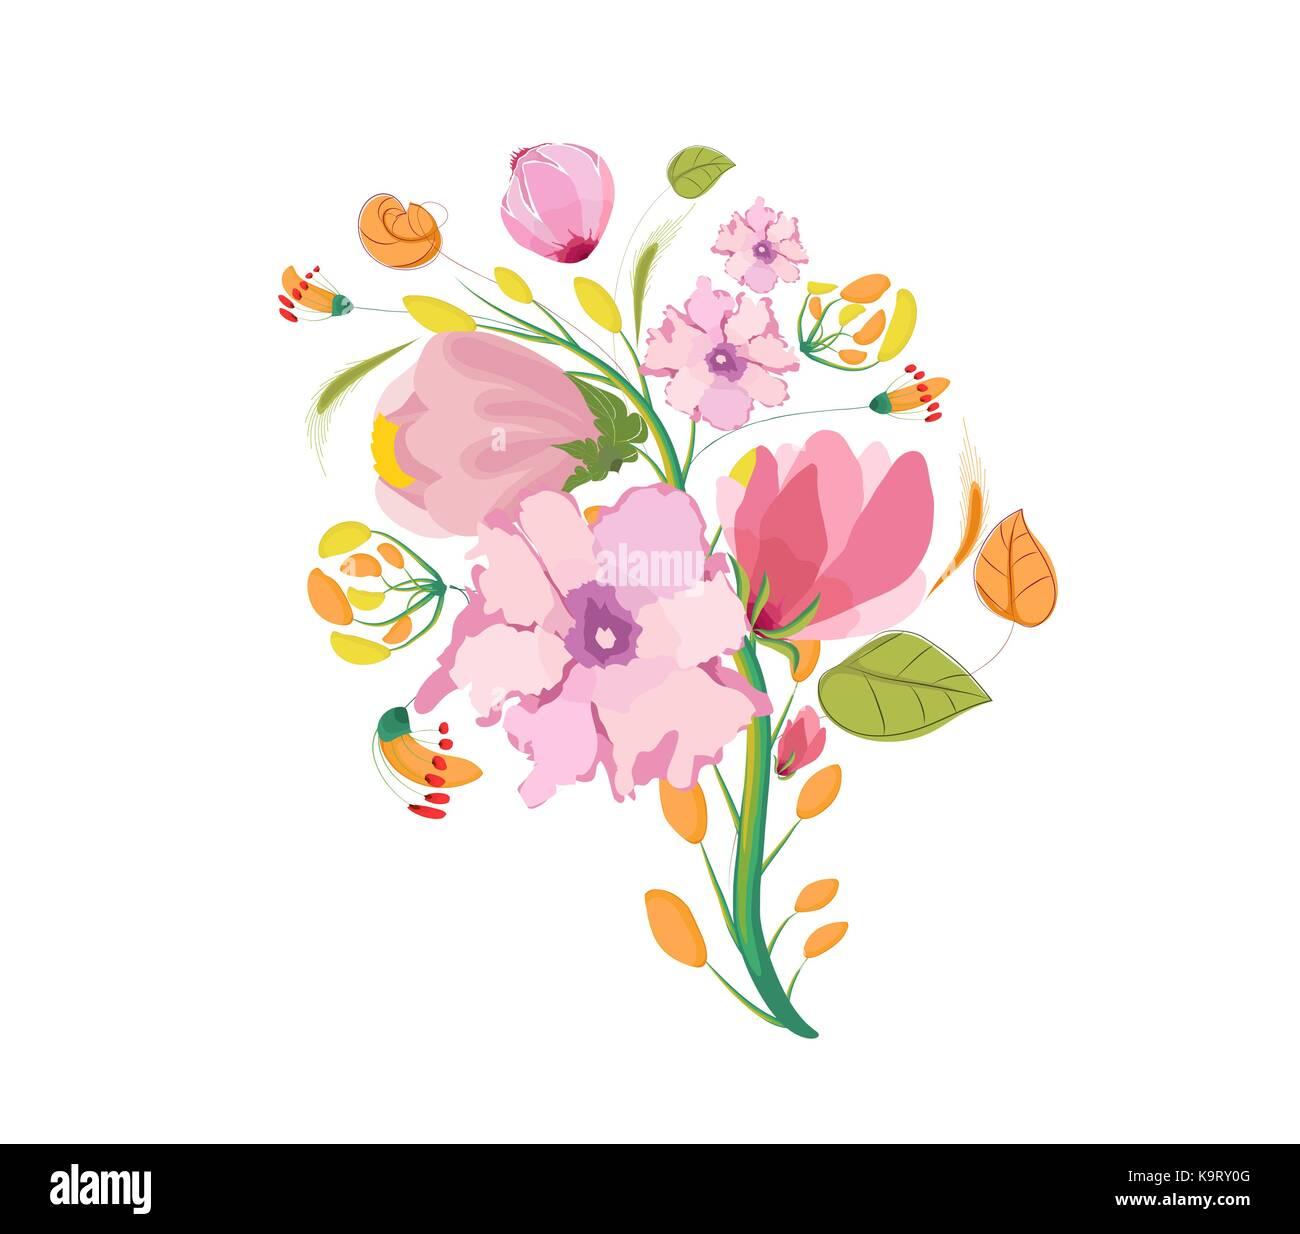 Flower Bouquet Watercolor Clipart Stock Vector Art & Illustration ...